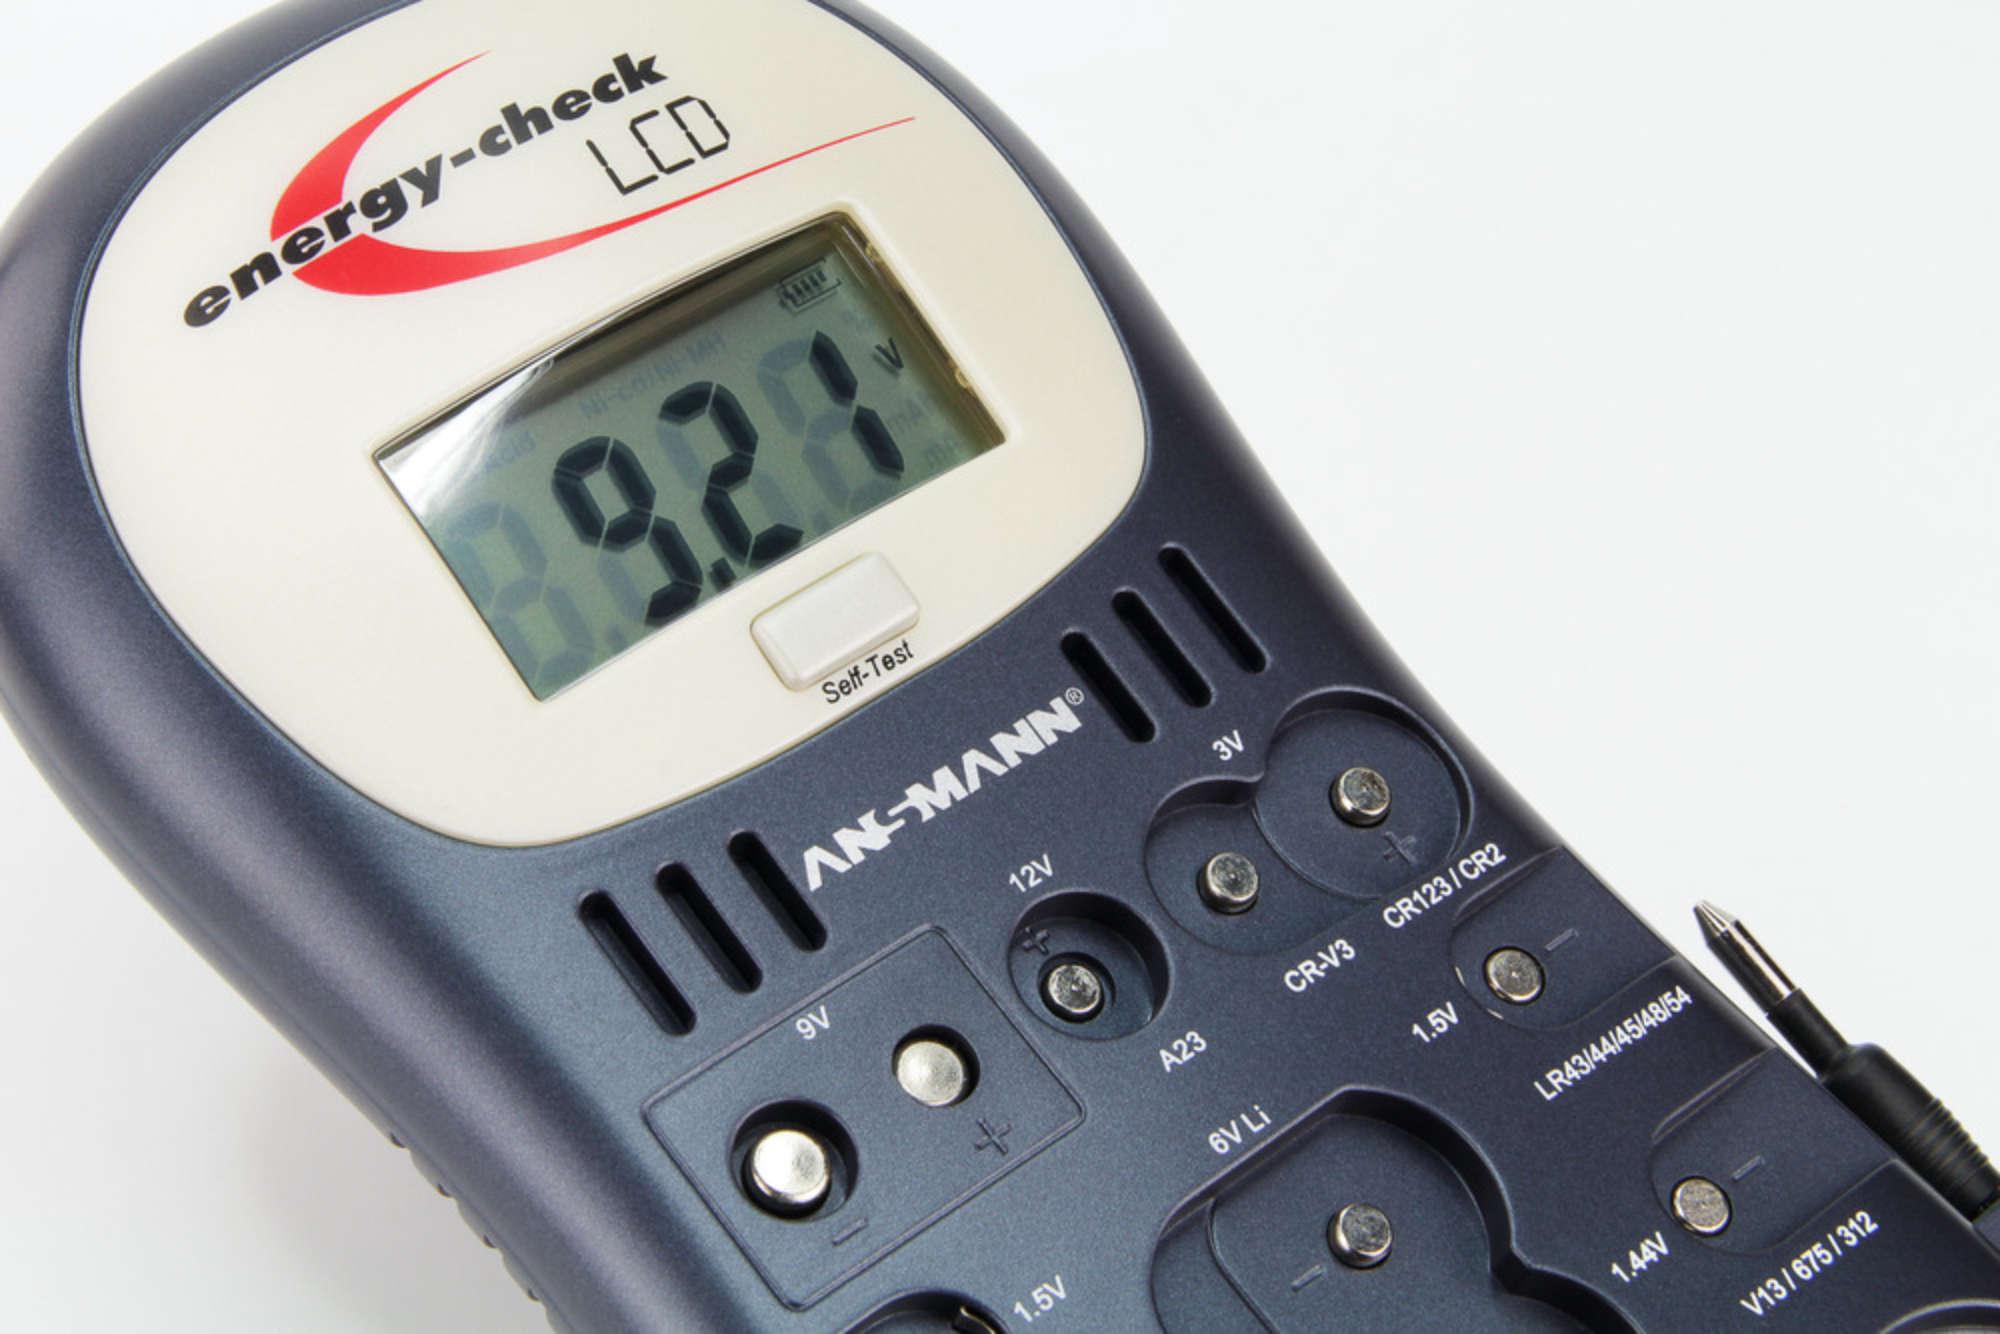 Battery Tester Energy Check LCD